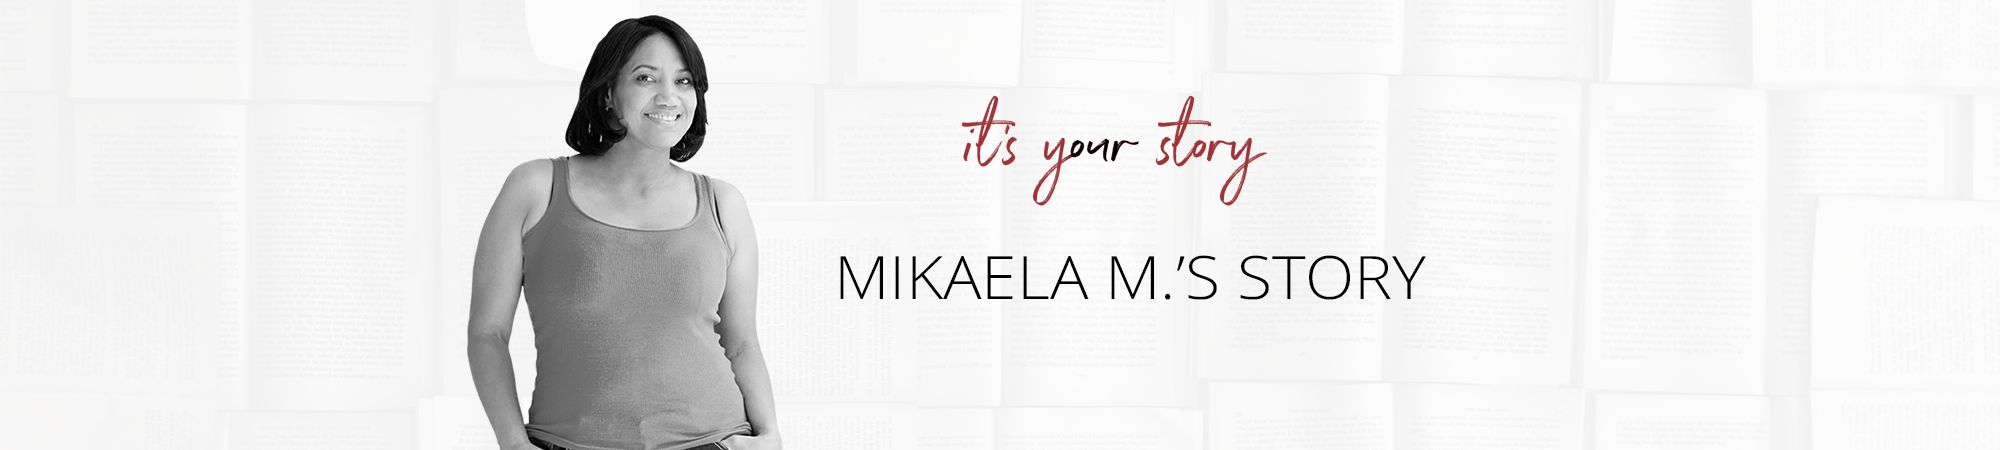 mikaela m story header